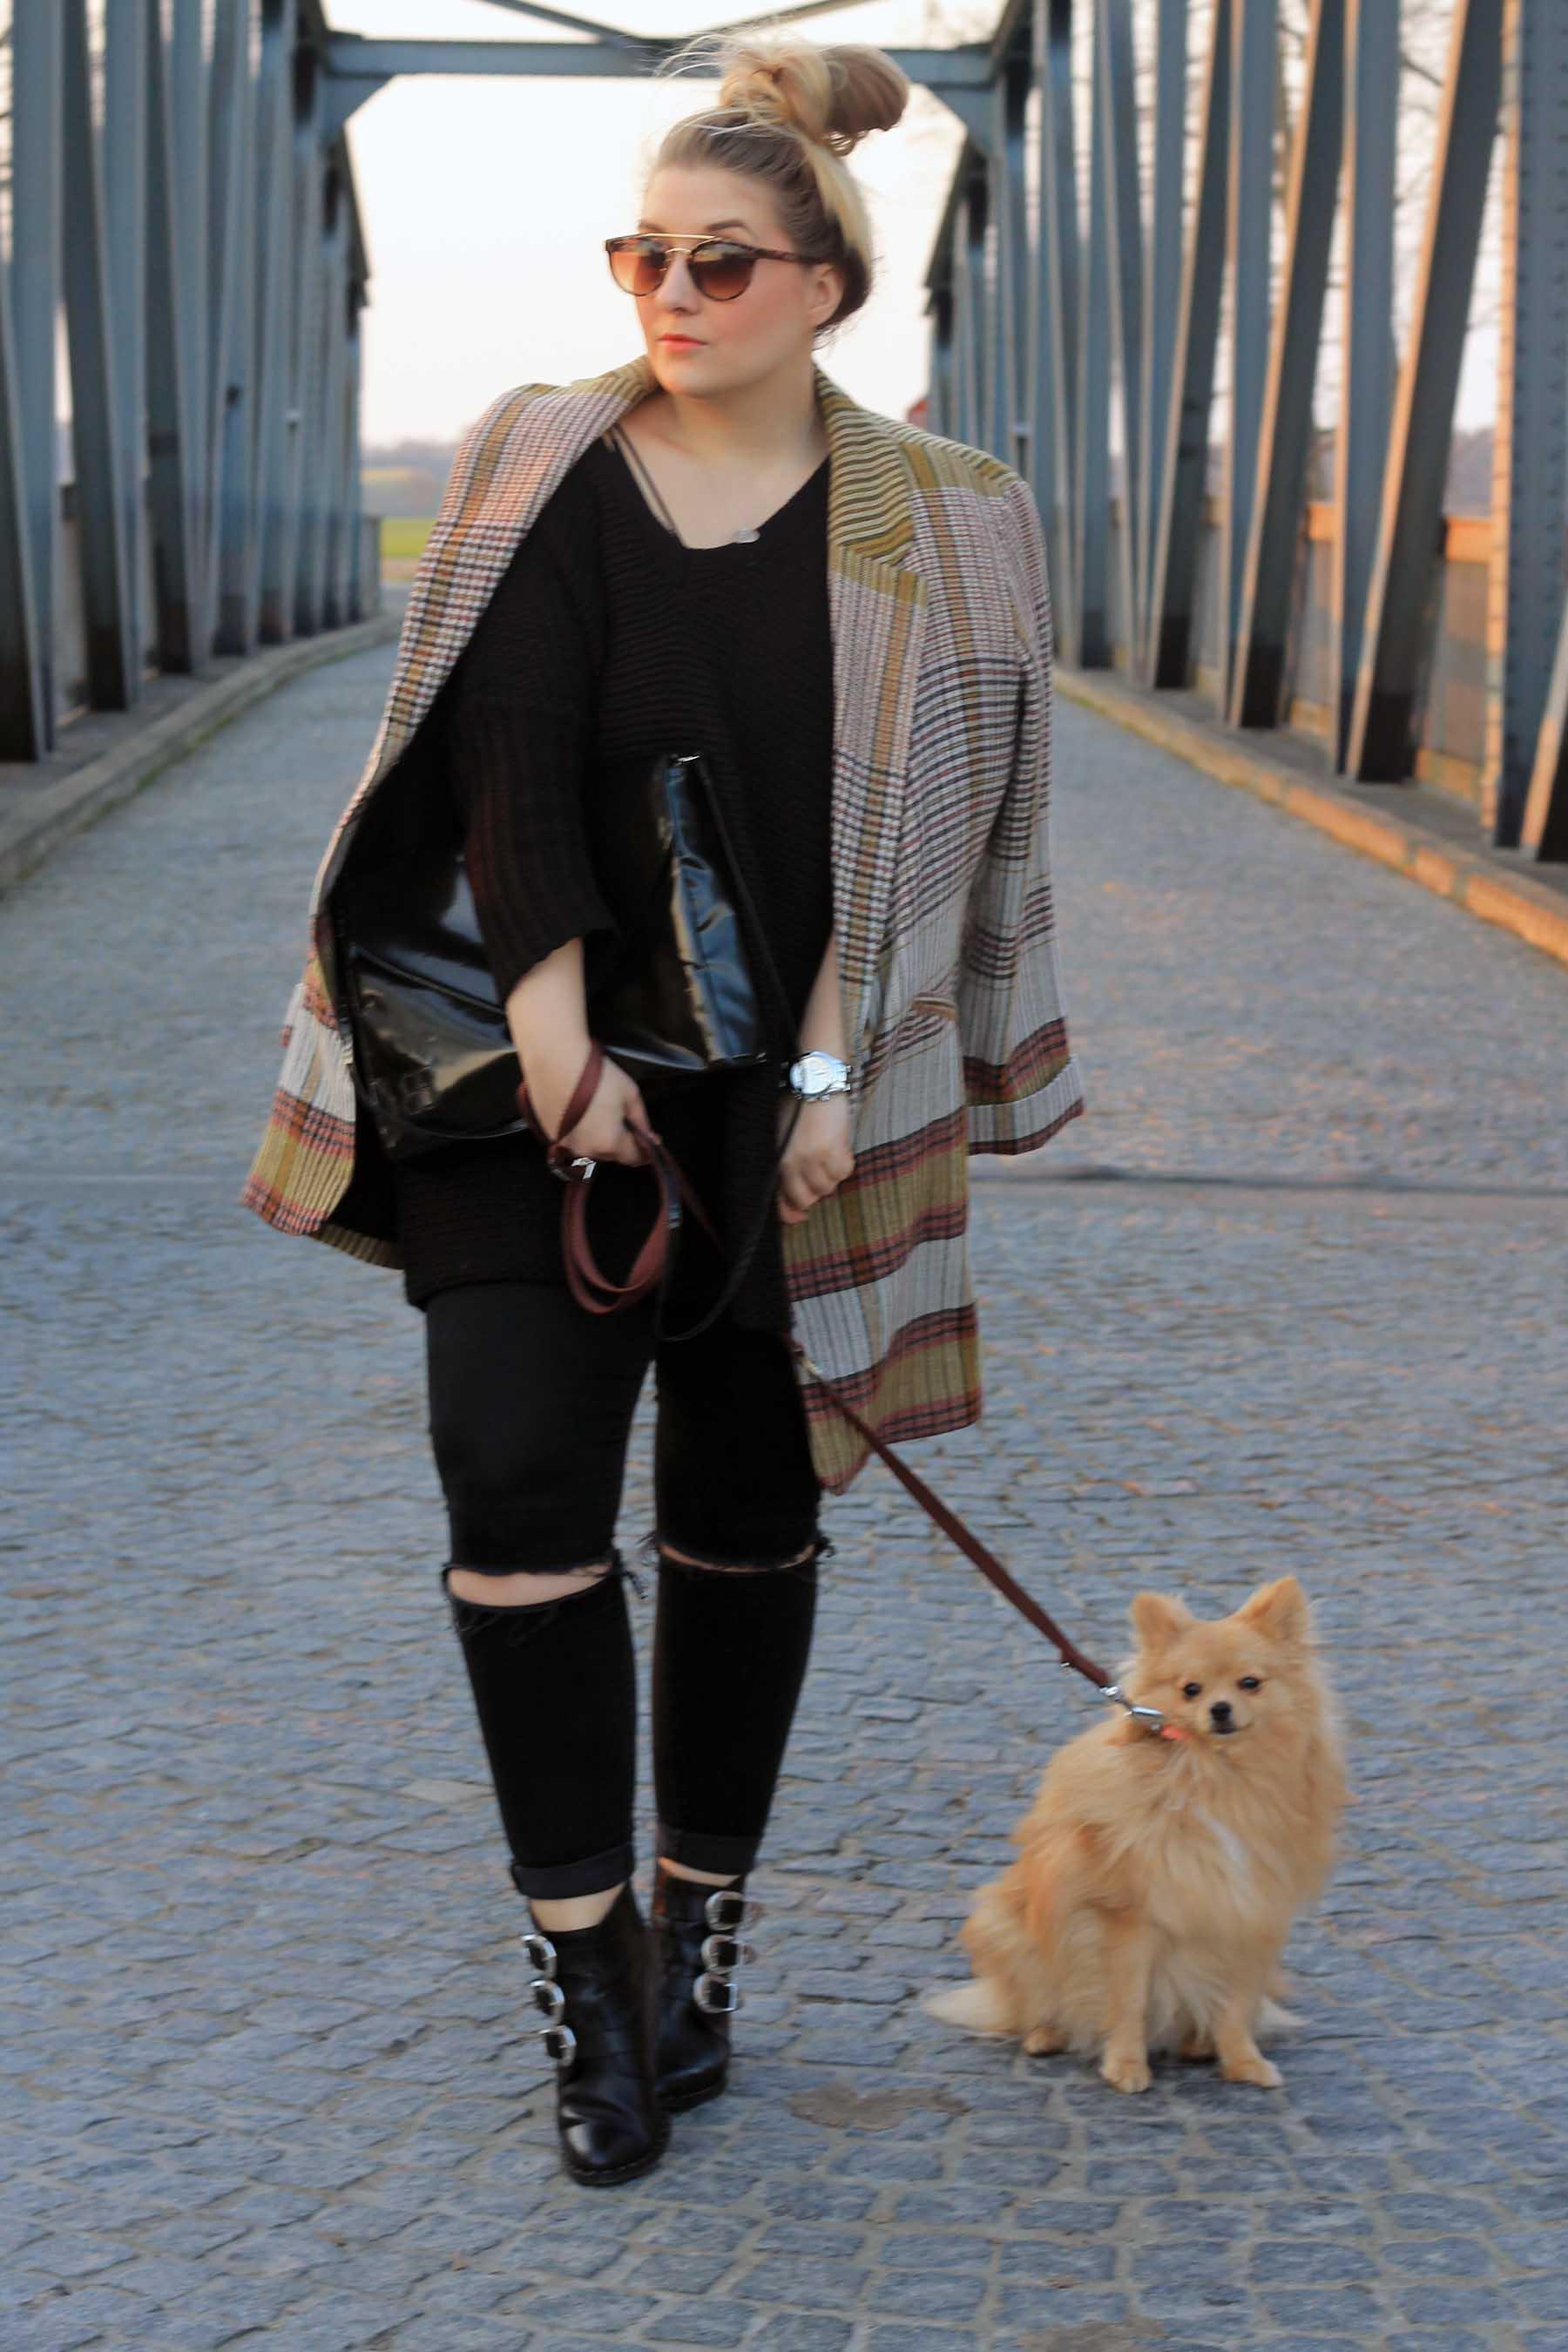 1-modeblog-fashionblog-pomeranian-zwergspitz-outfit-look